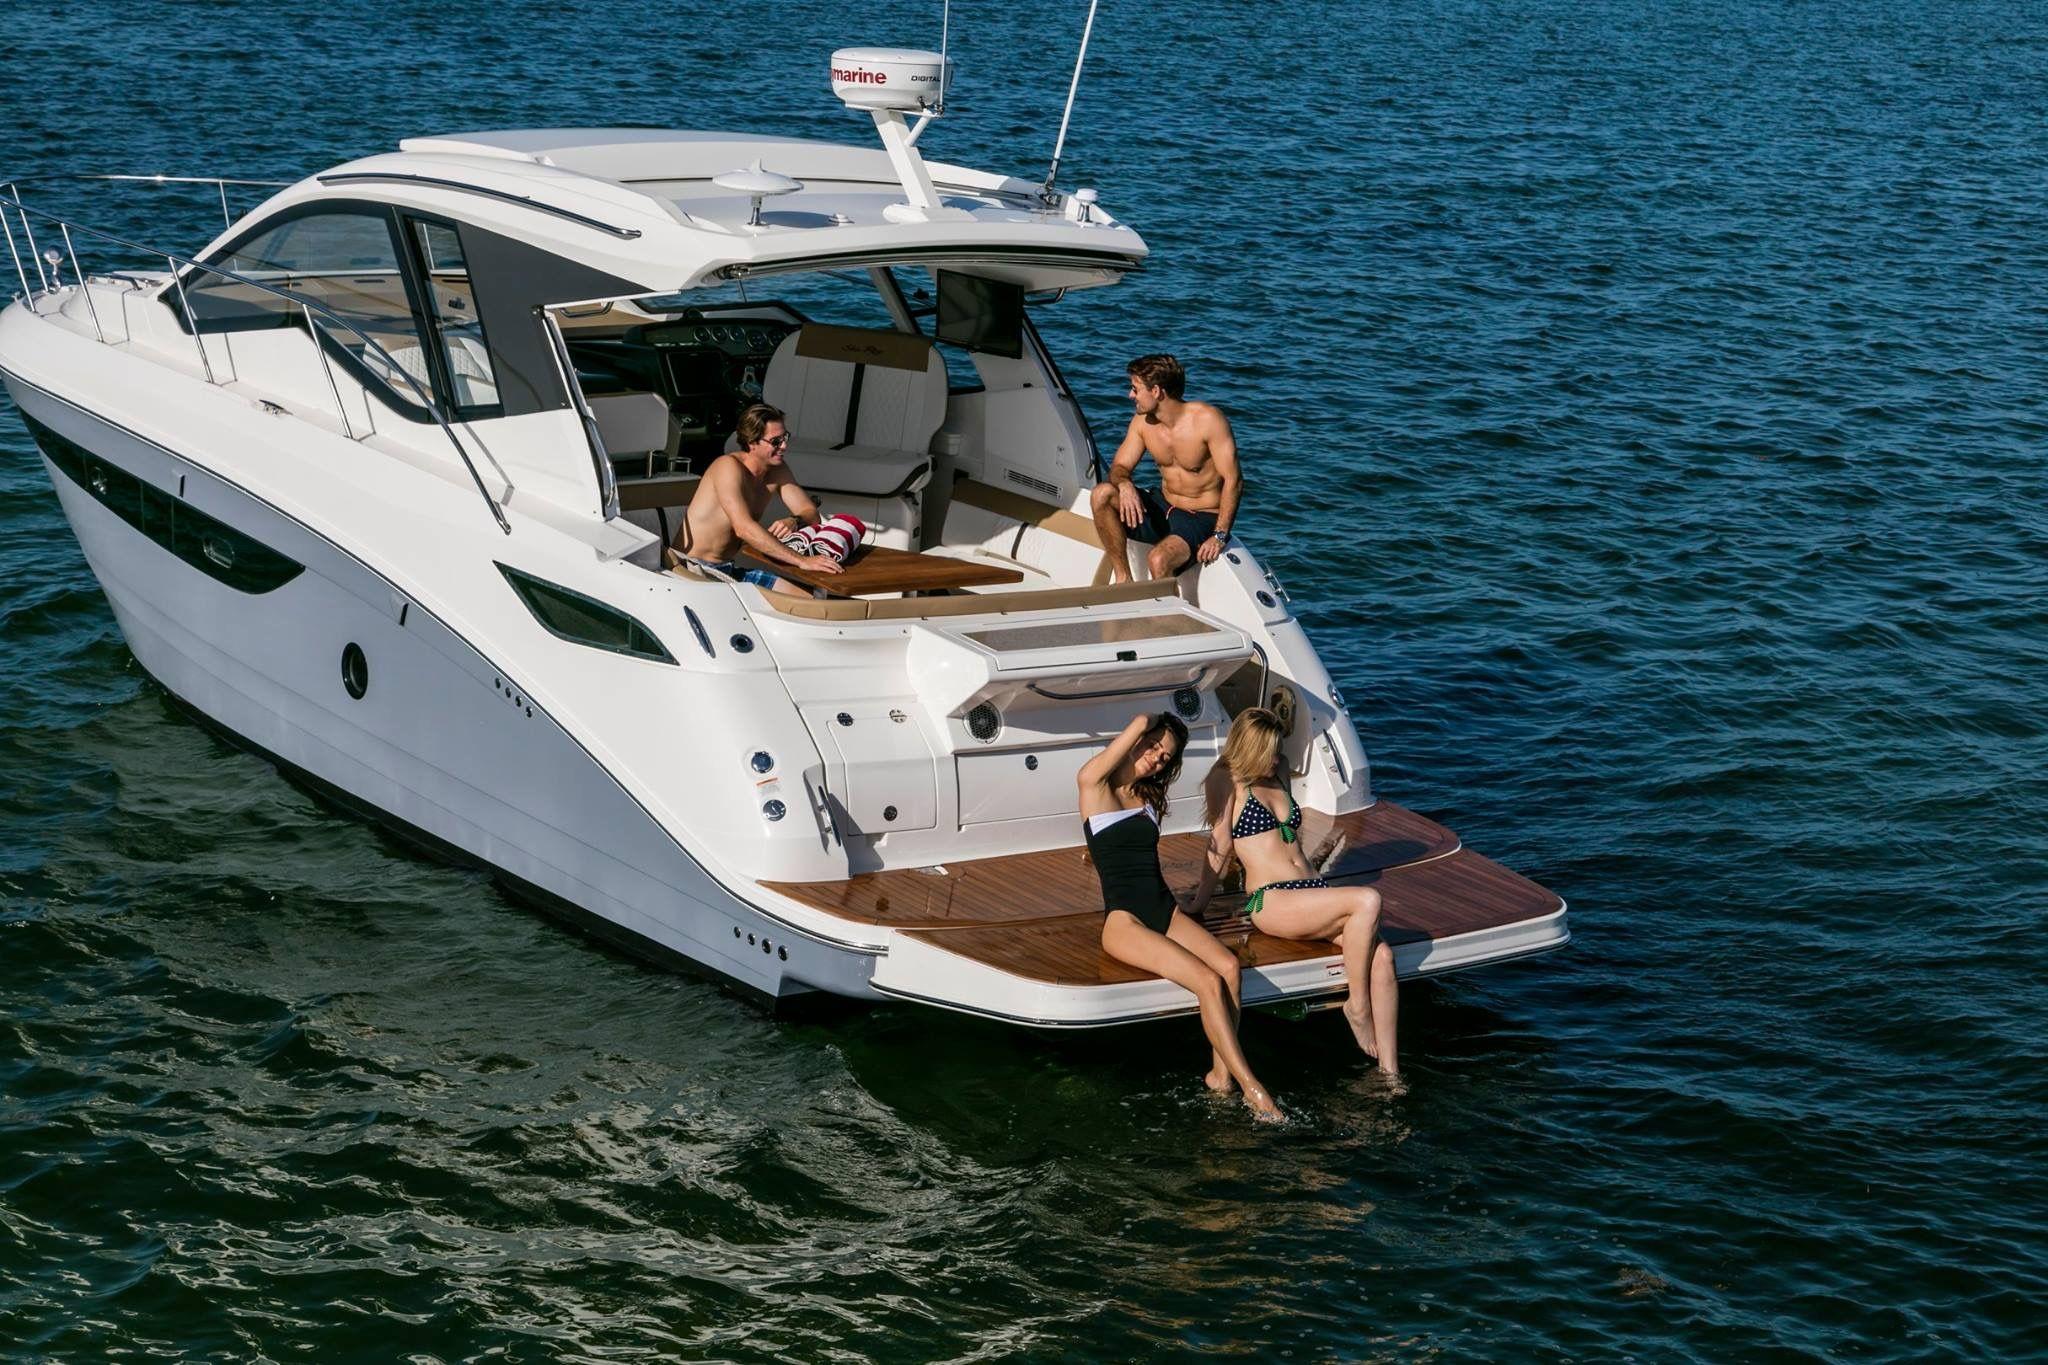 Sea Ray Sundancer 350 Coupe Cruiser Boat Sea Ray Boat Boat